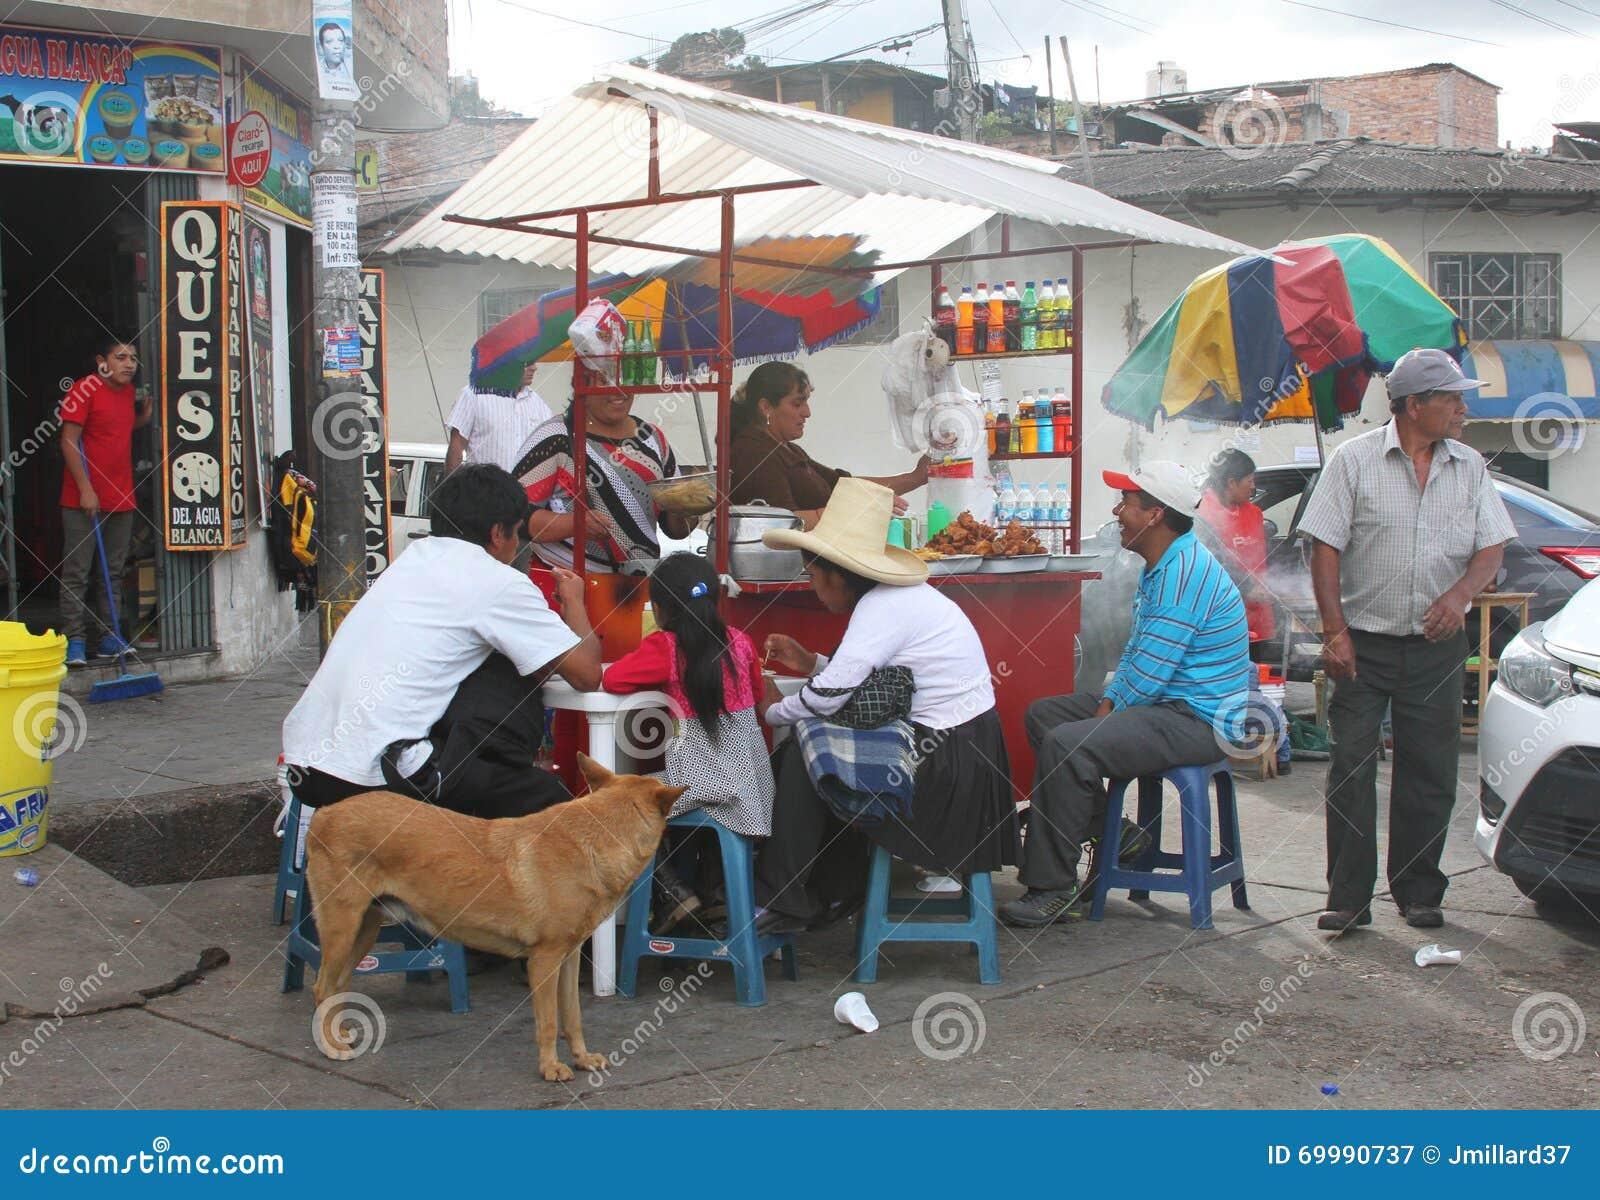 Peruviani che mangiano a Fried Chicken Kiosk